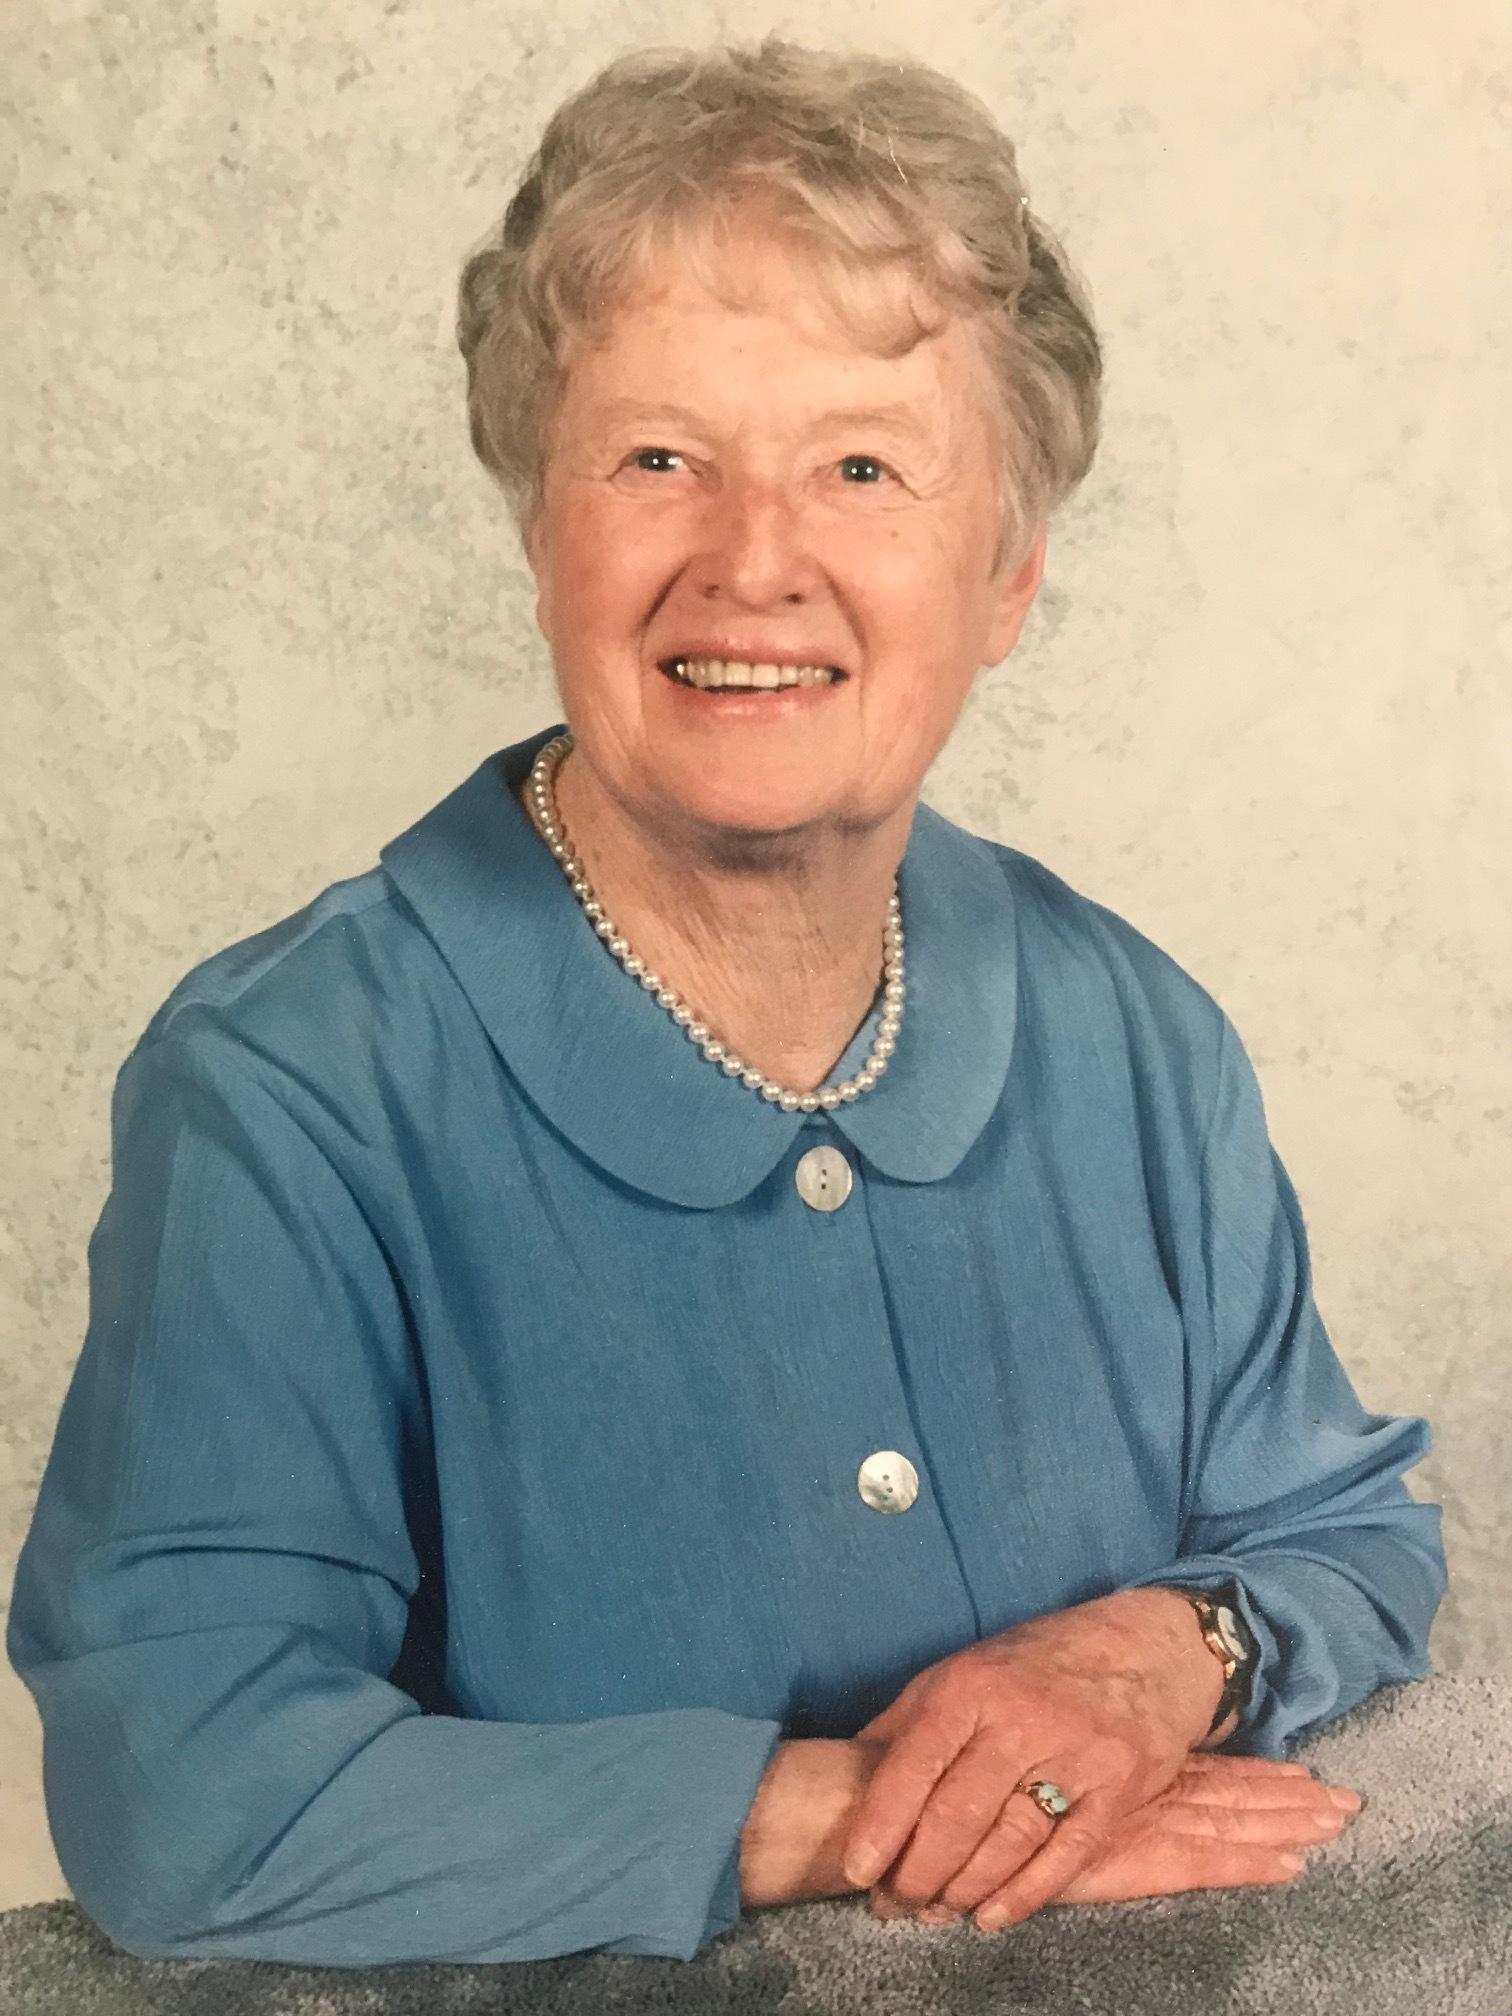 COMMUNITY - Obituary - Peggy Behnke WEB.jpg